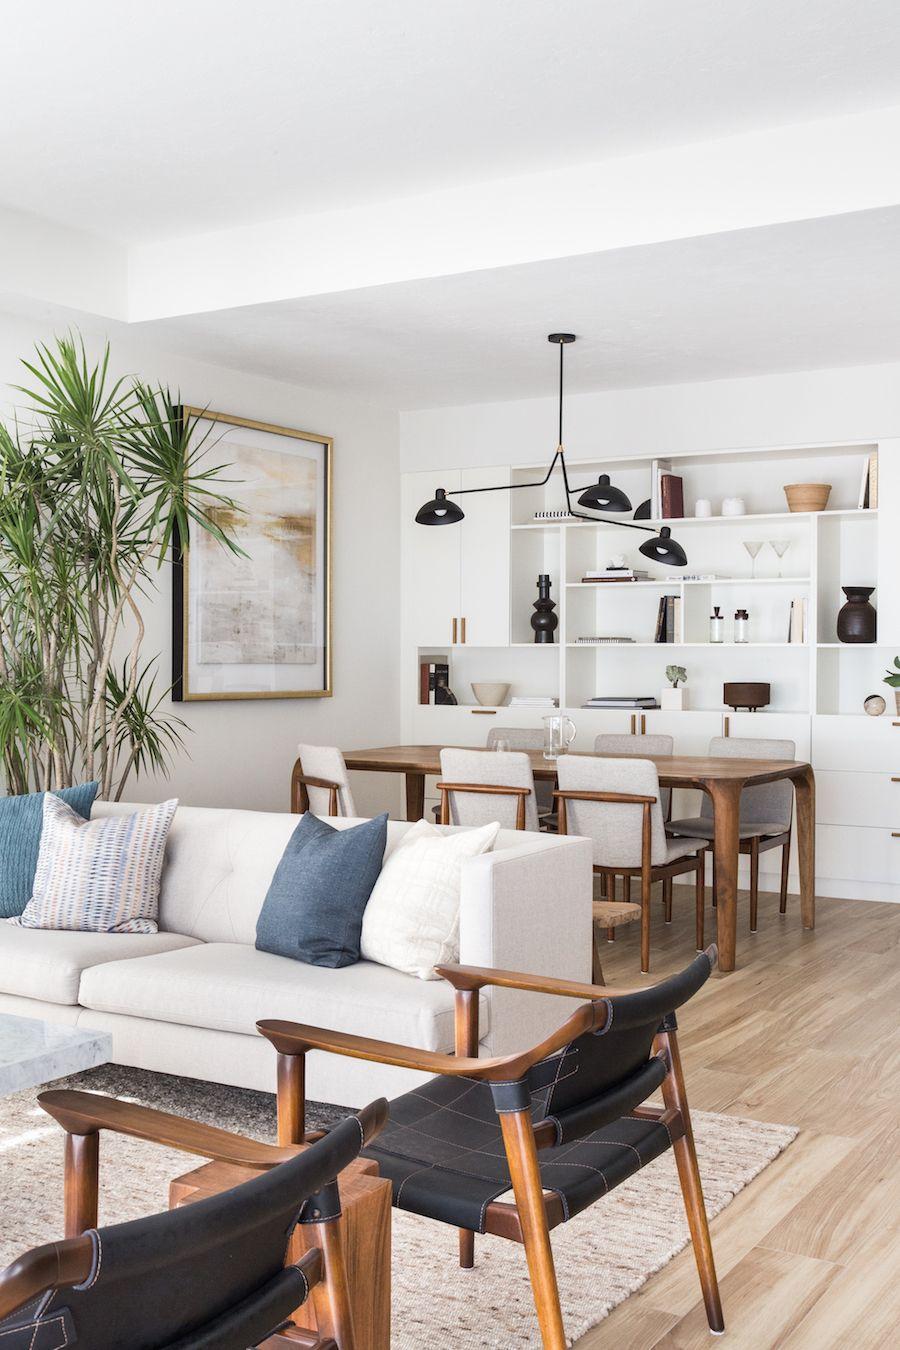 Project Miami | The Reveal - Avenue Lifestyle Avenue Lifestyle ...